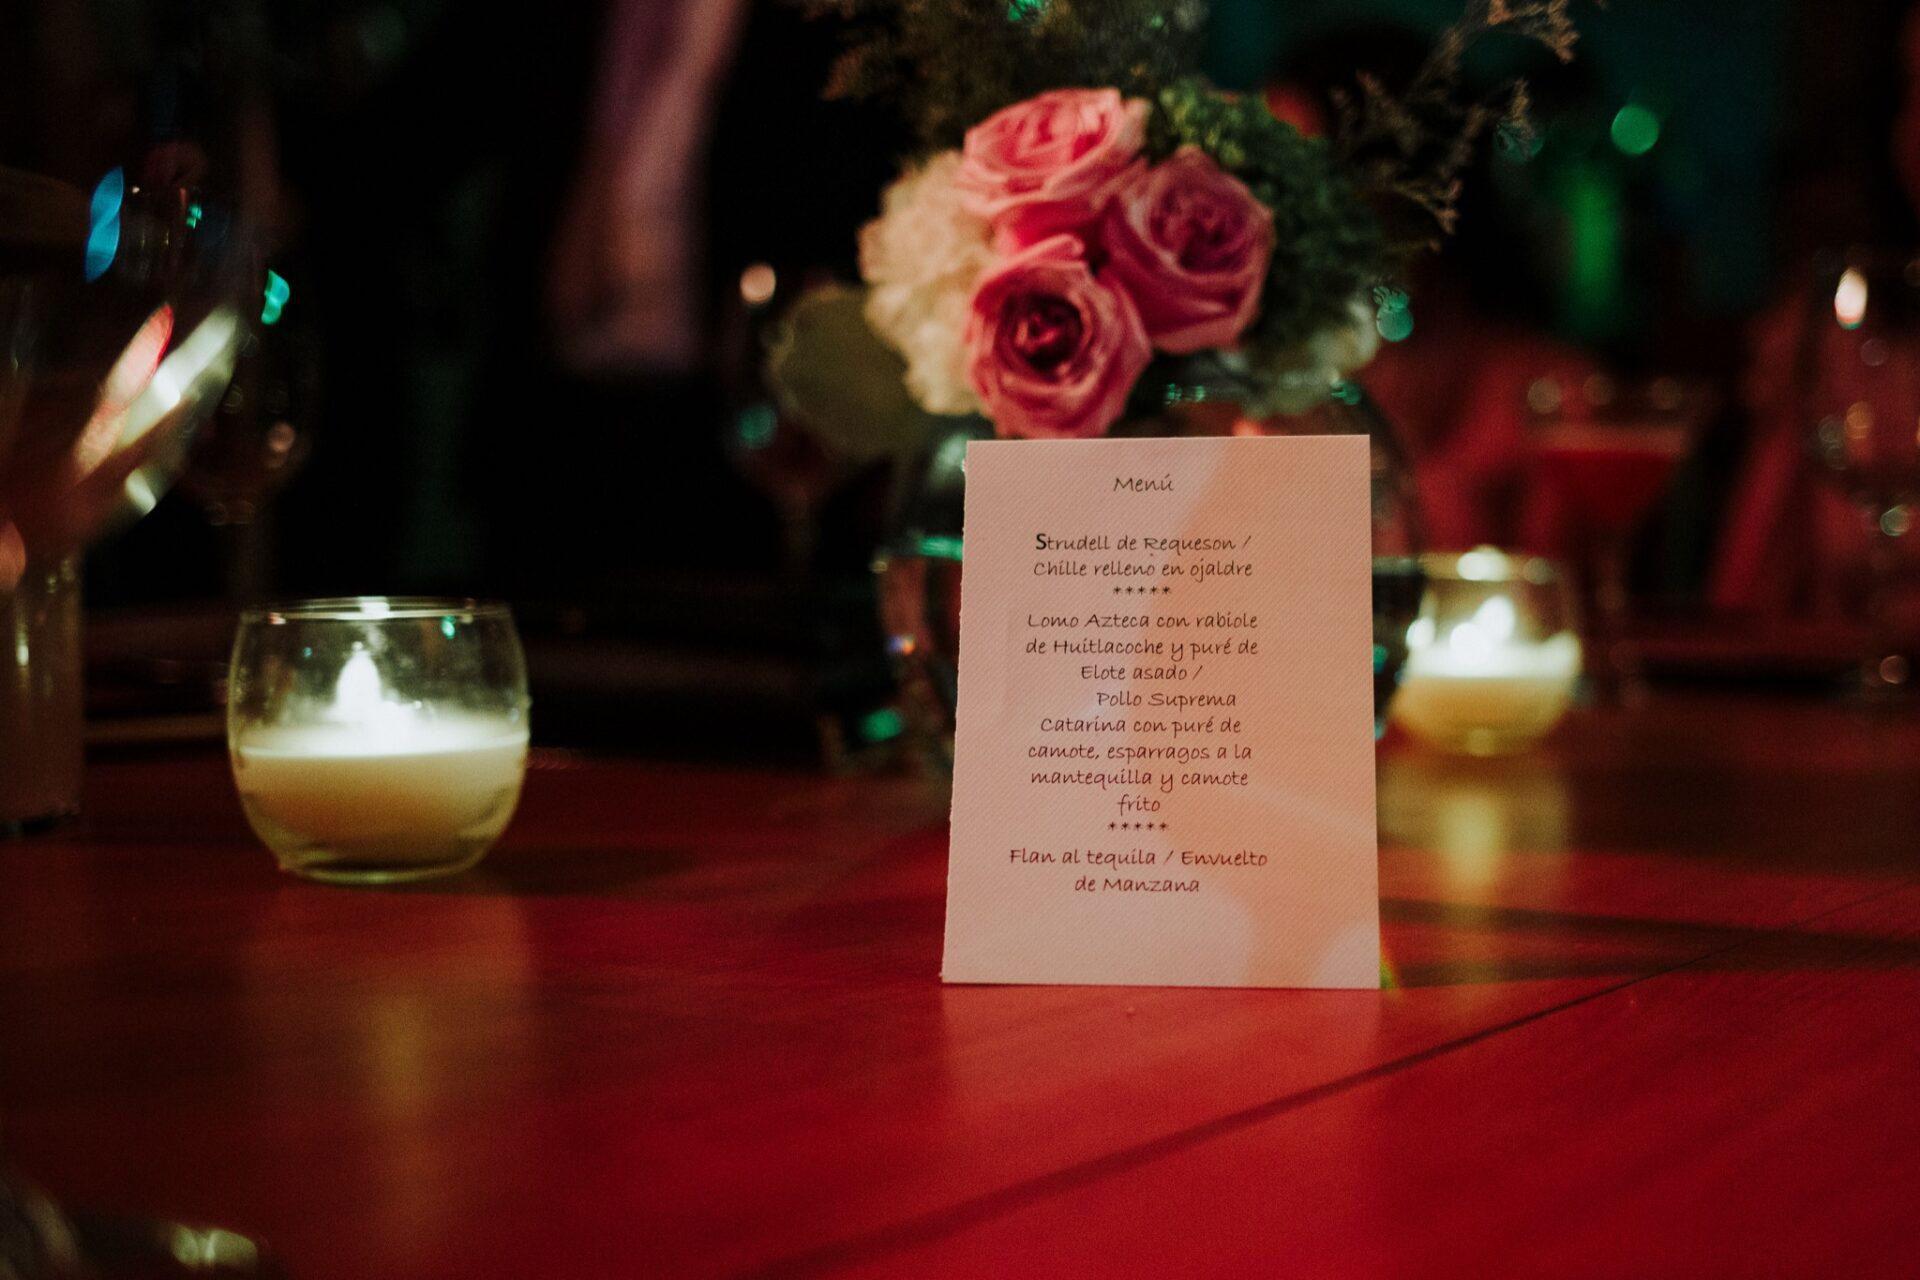 javier_noriega_fotografo_bodas_teul_zacatecas_wedding_photographer32